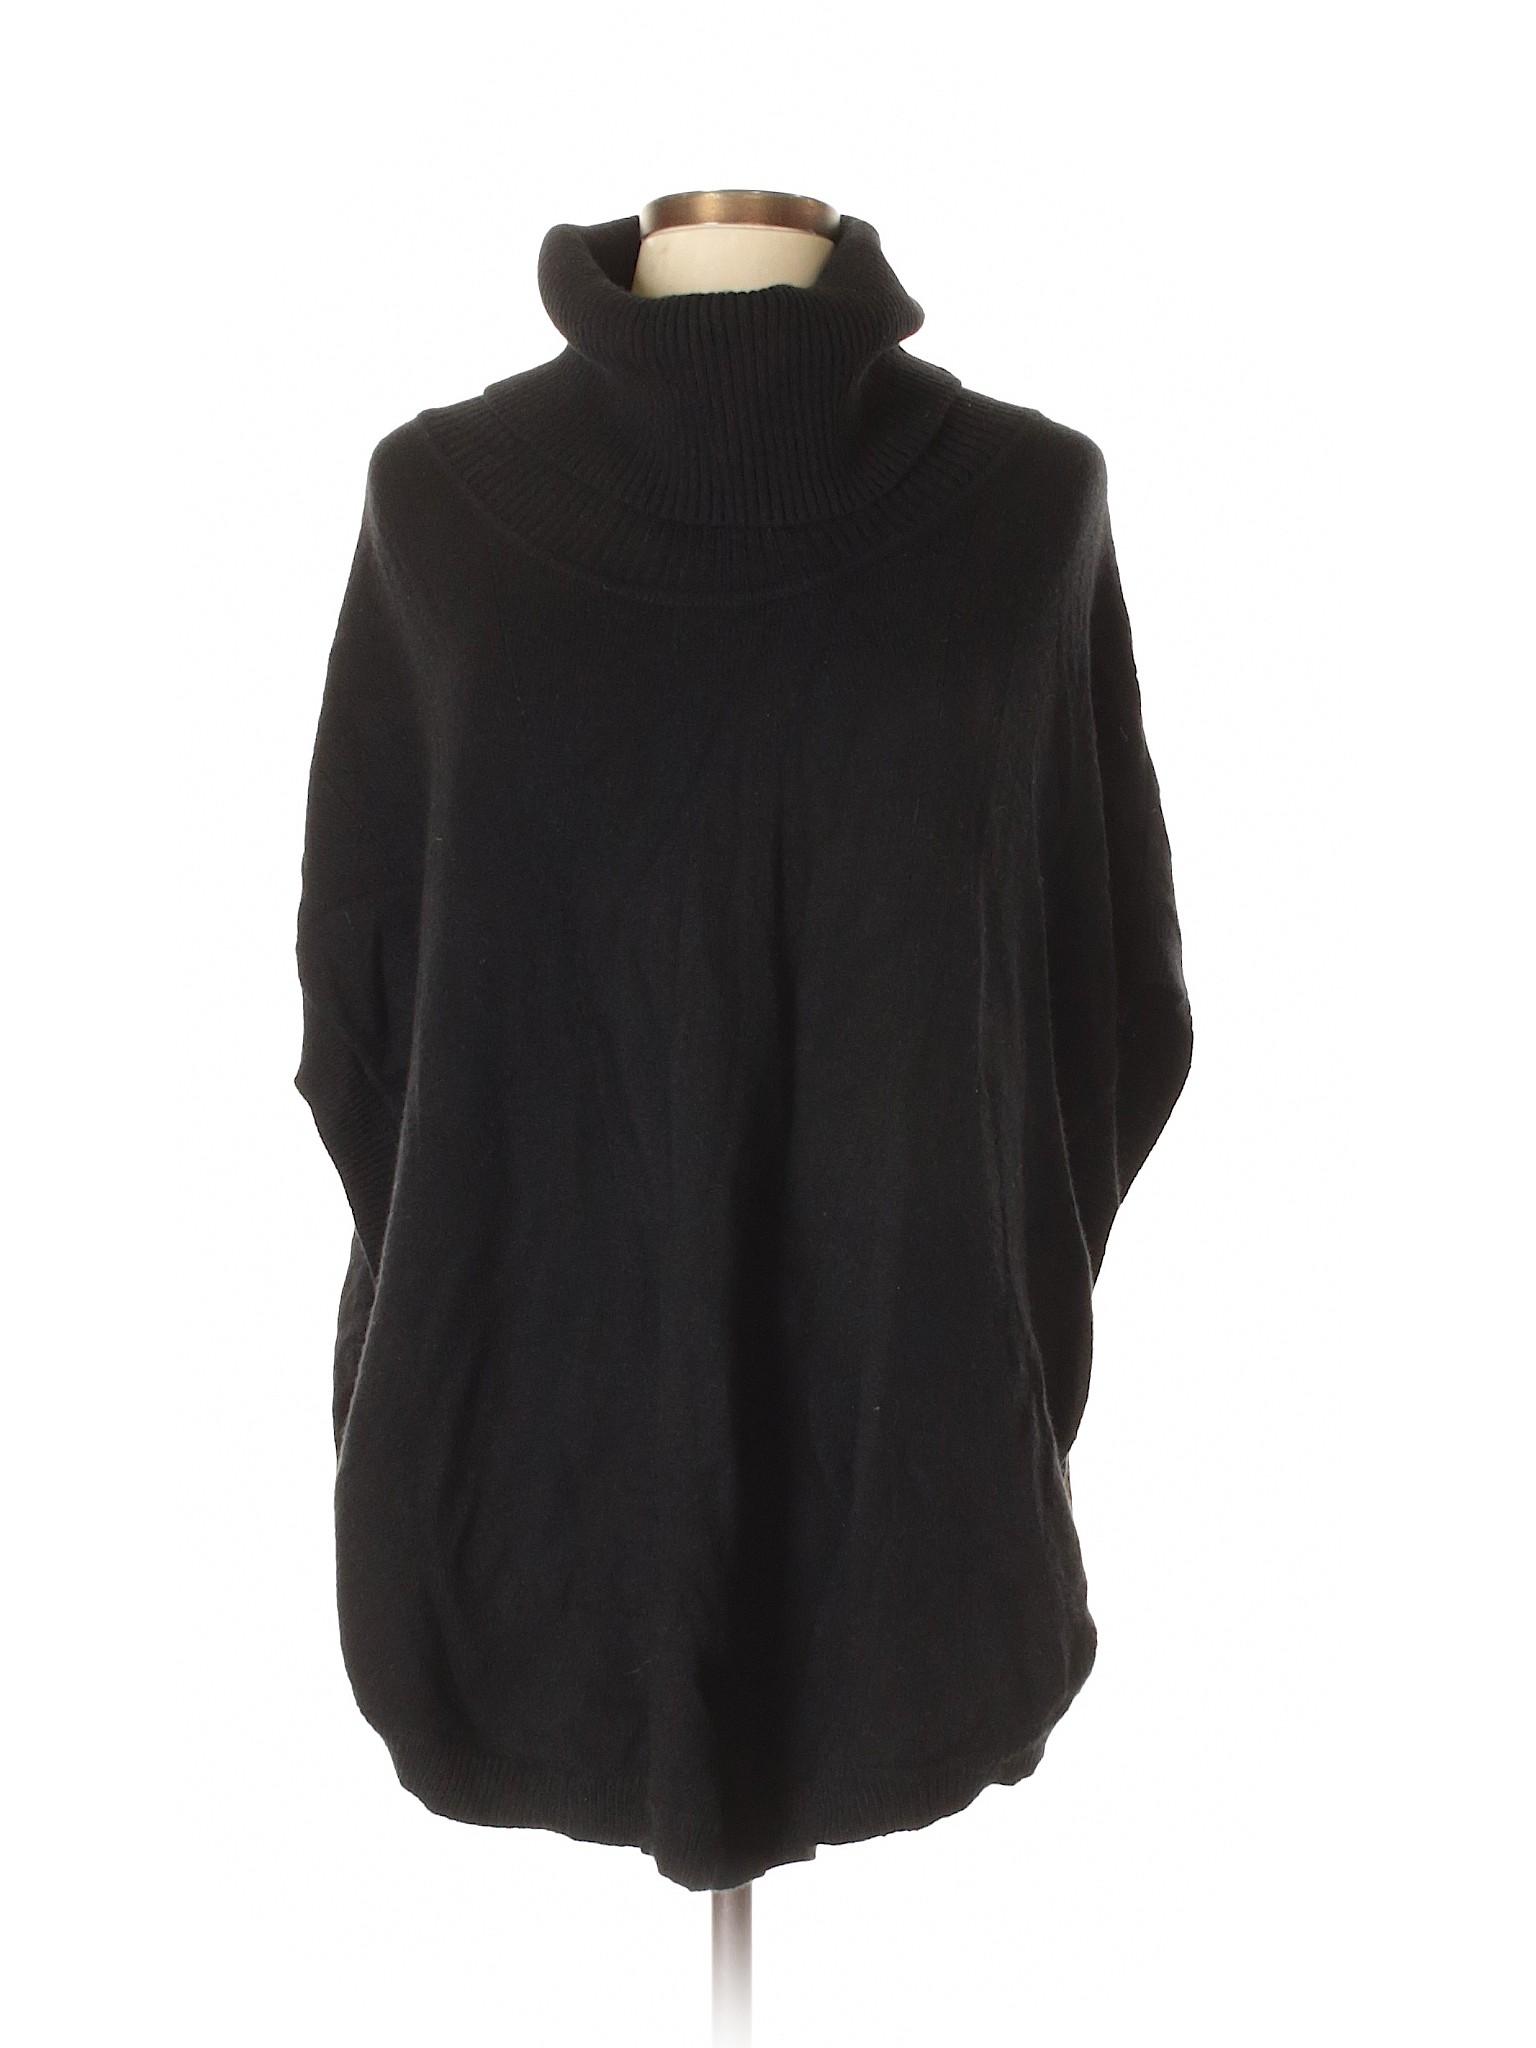 winter Pullover Pullover Sisters winter Sweater Boutique Boutique Sisters nBIq5I